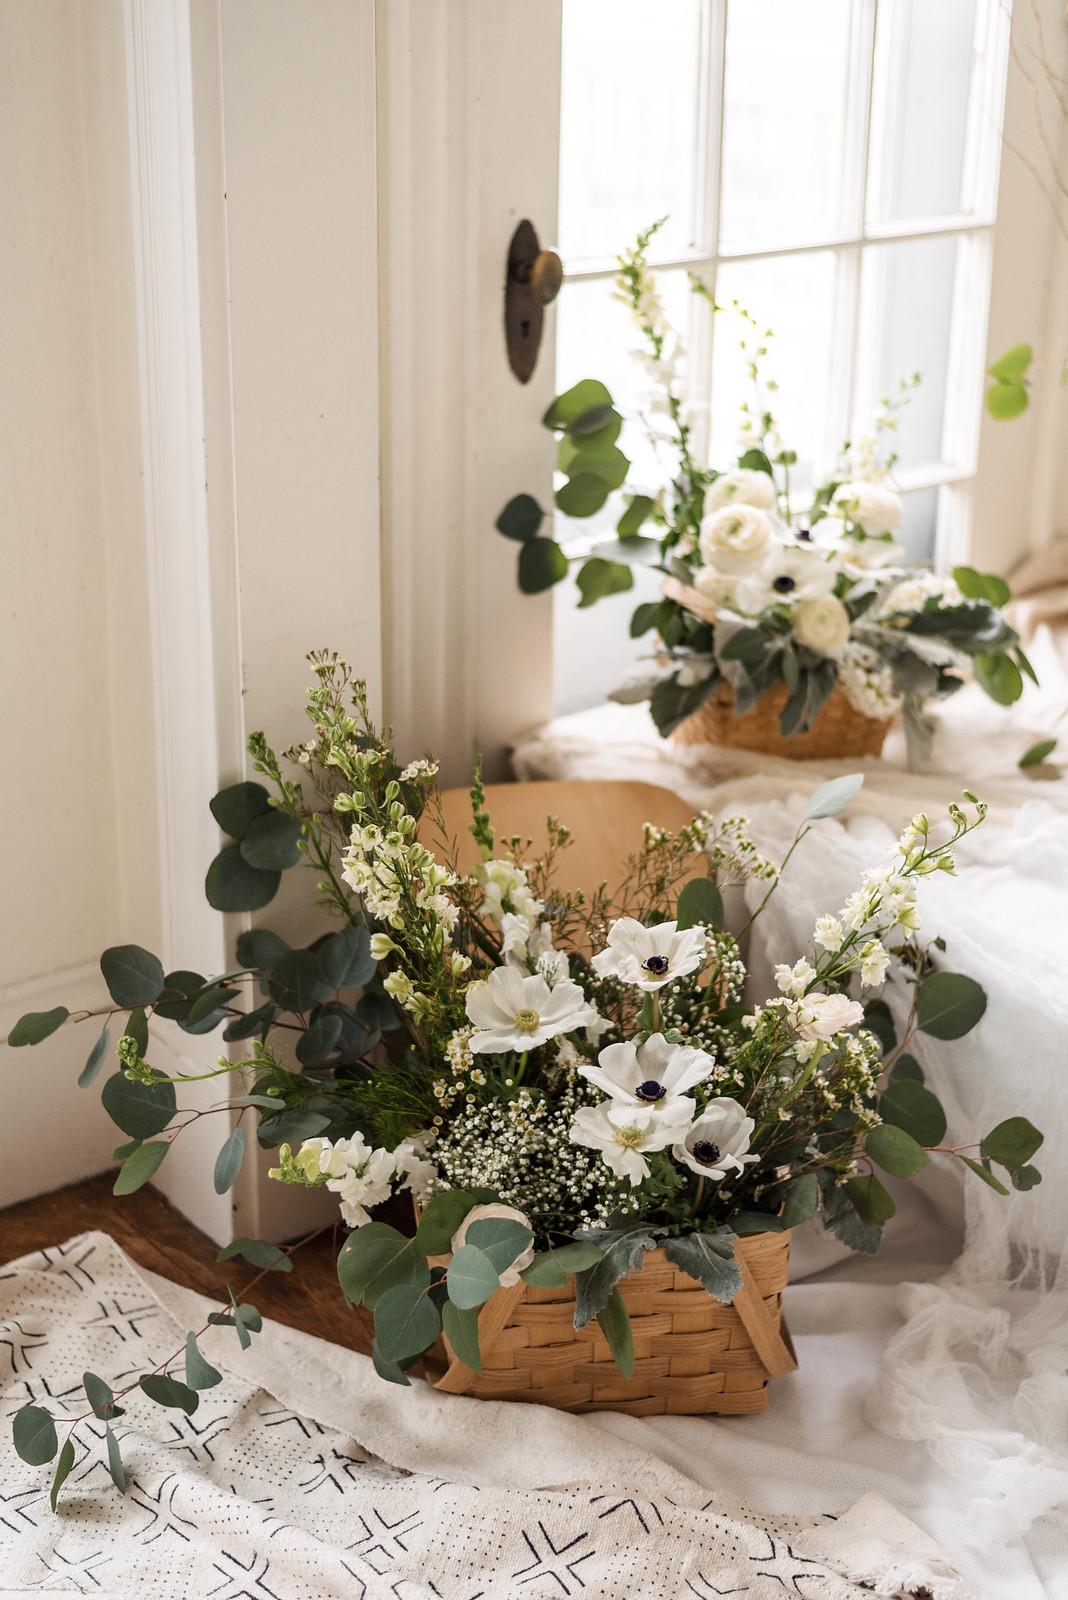 Picnic Flowers on http://juliettelaura.blogspot.com/